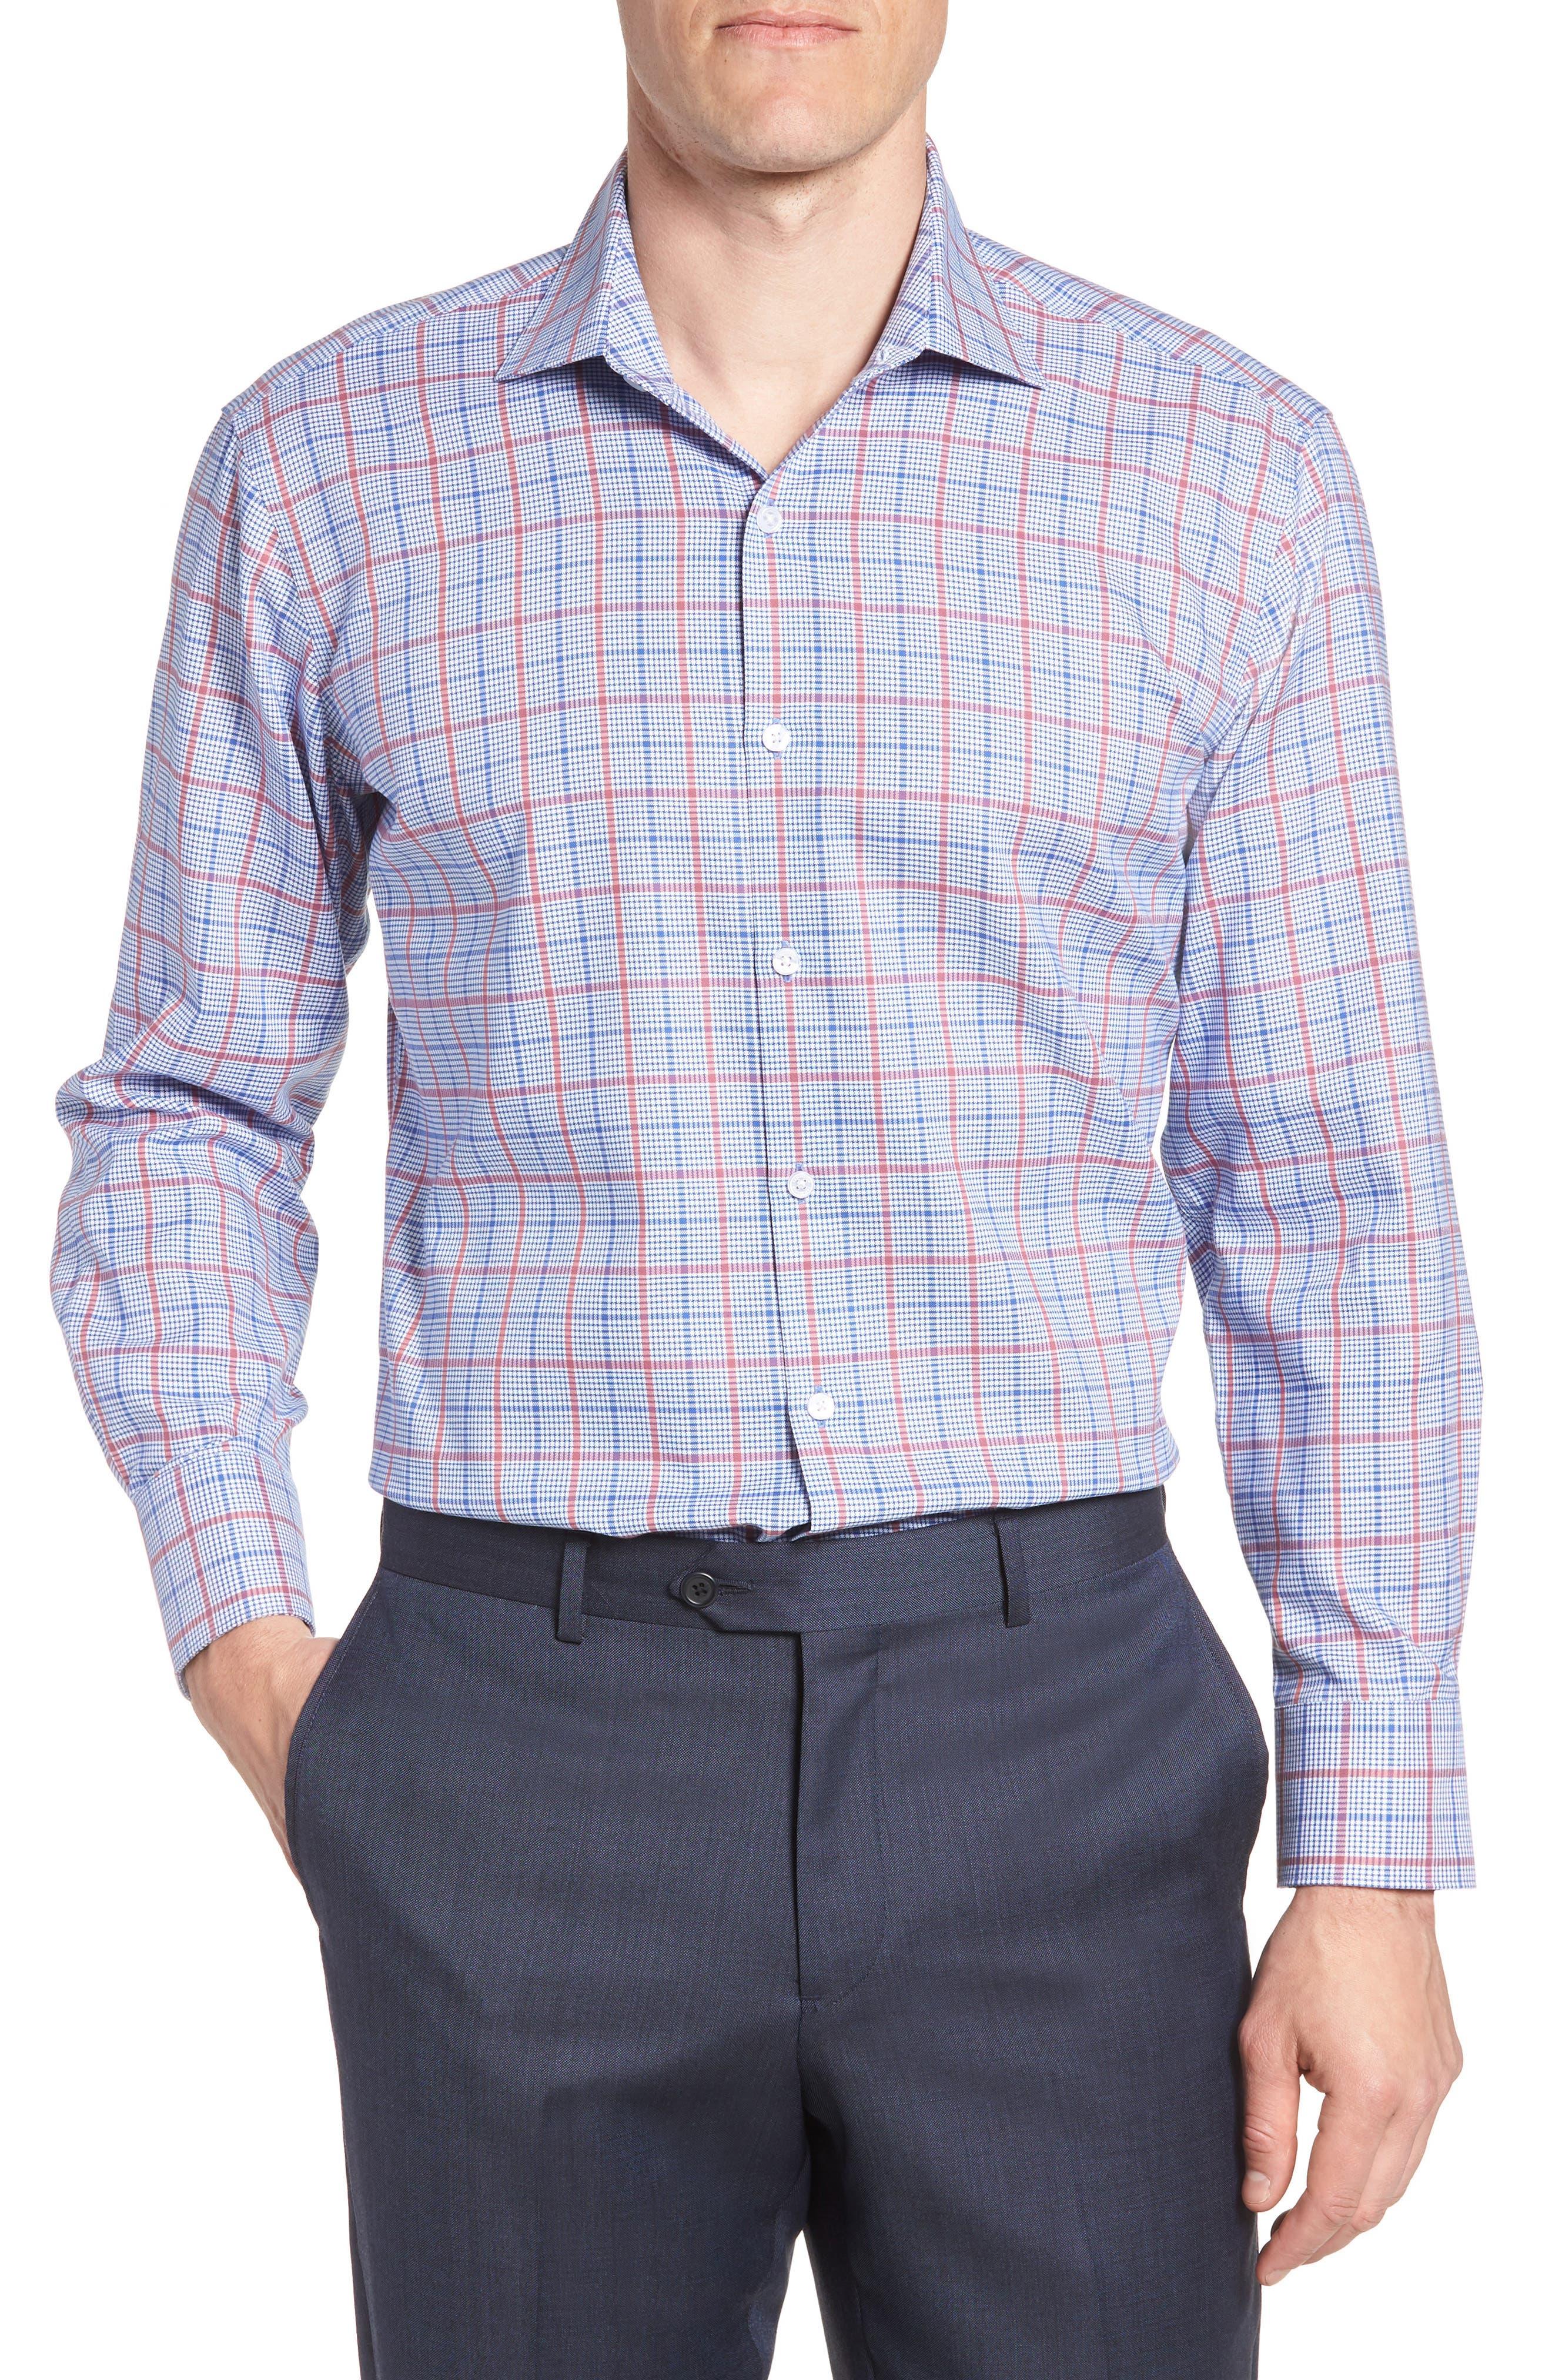 Kai Trim Fit Check Dress Shirt,                             Main thumbnail 1, color,                             400